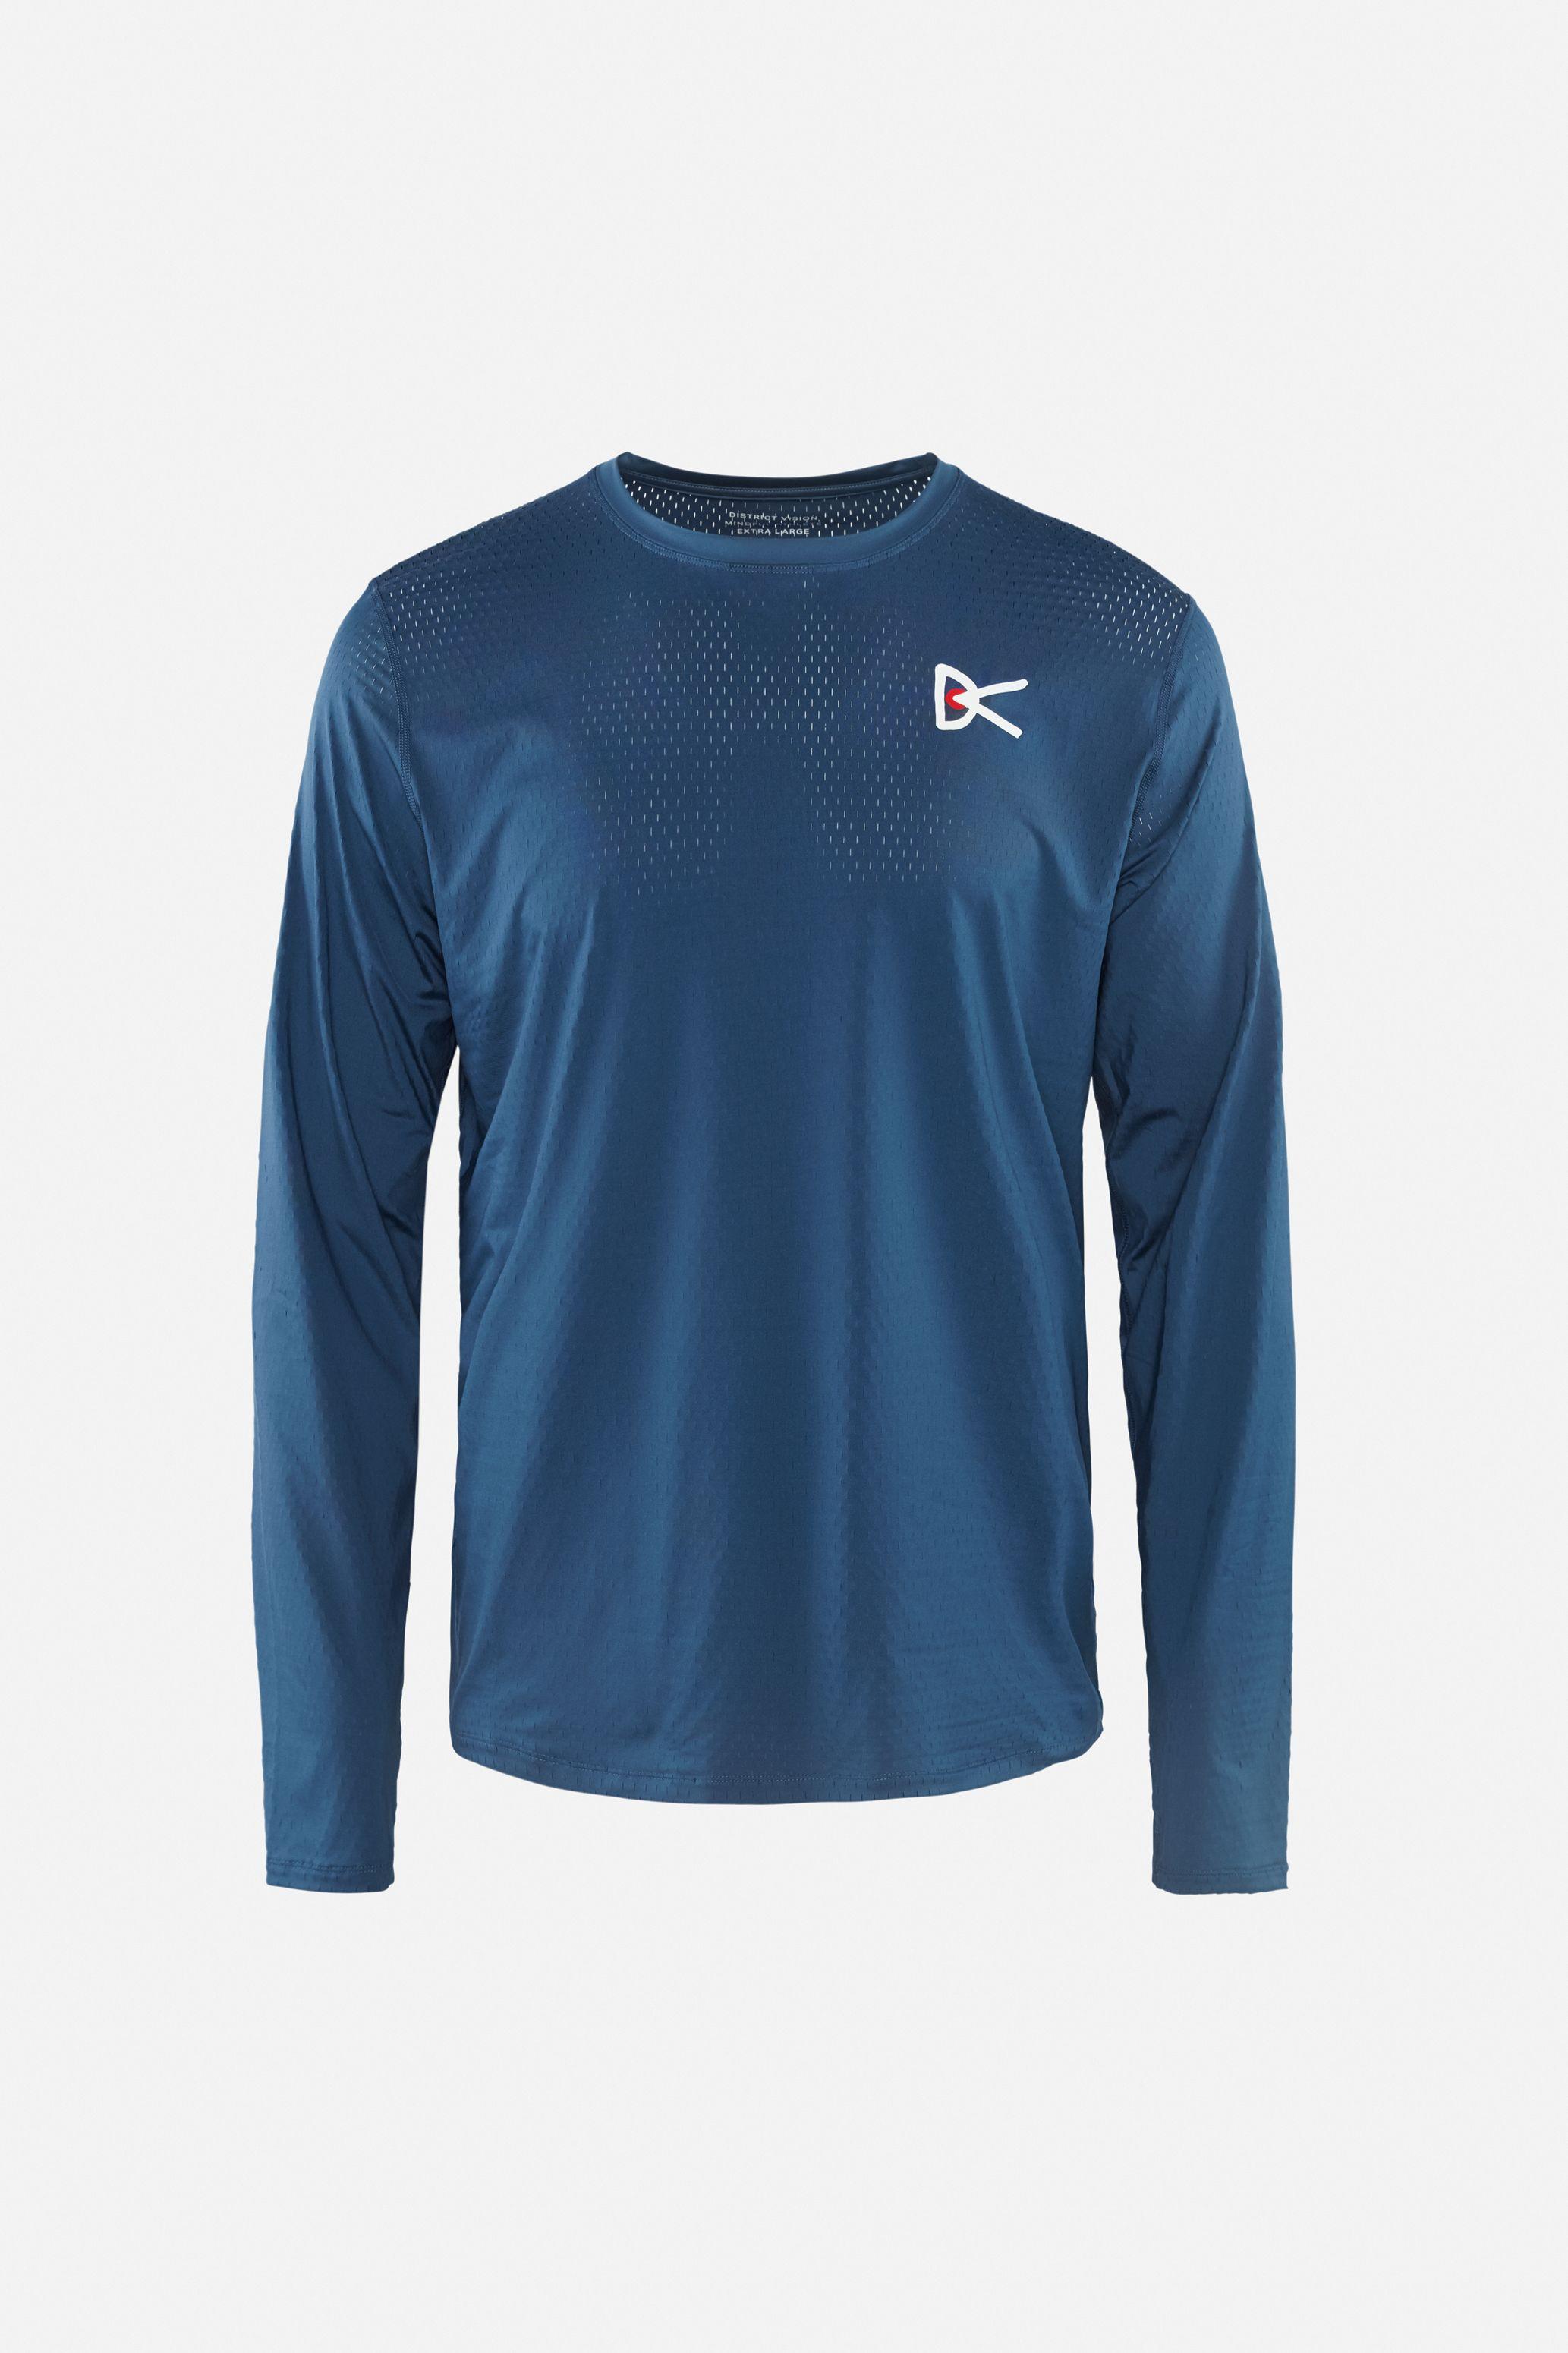 Air––Wear Long Sleeve T-Shirt, Blue